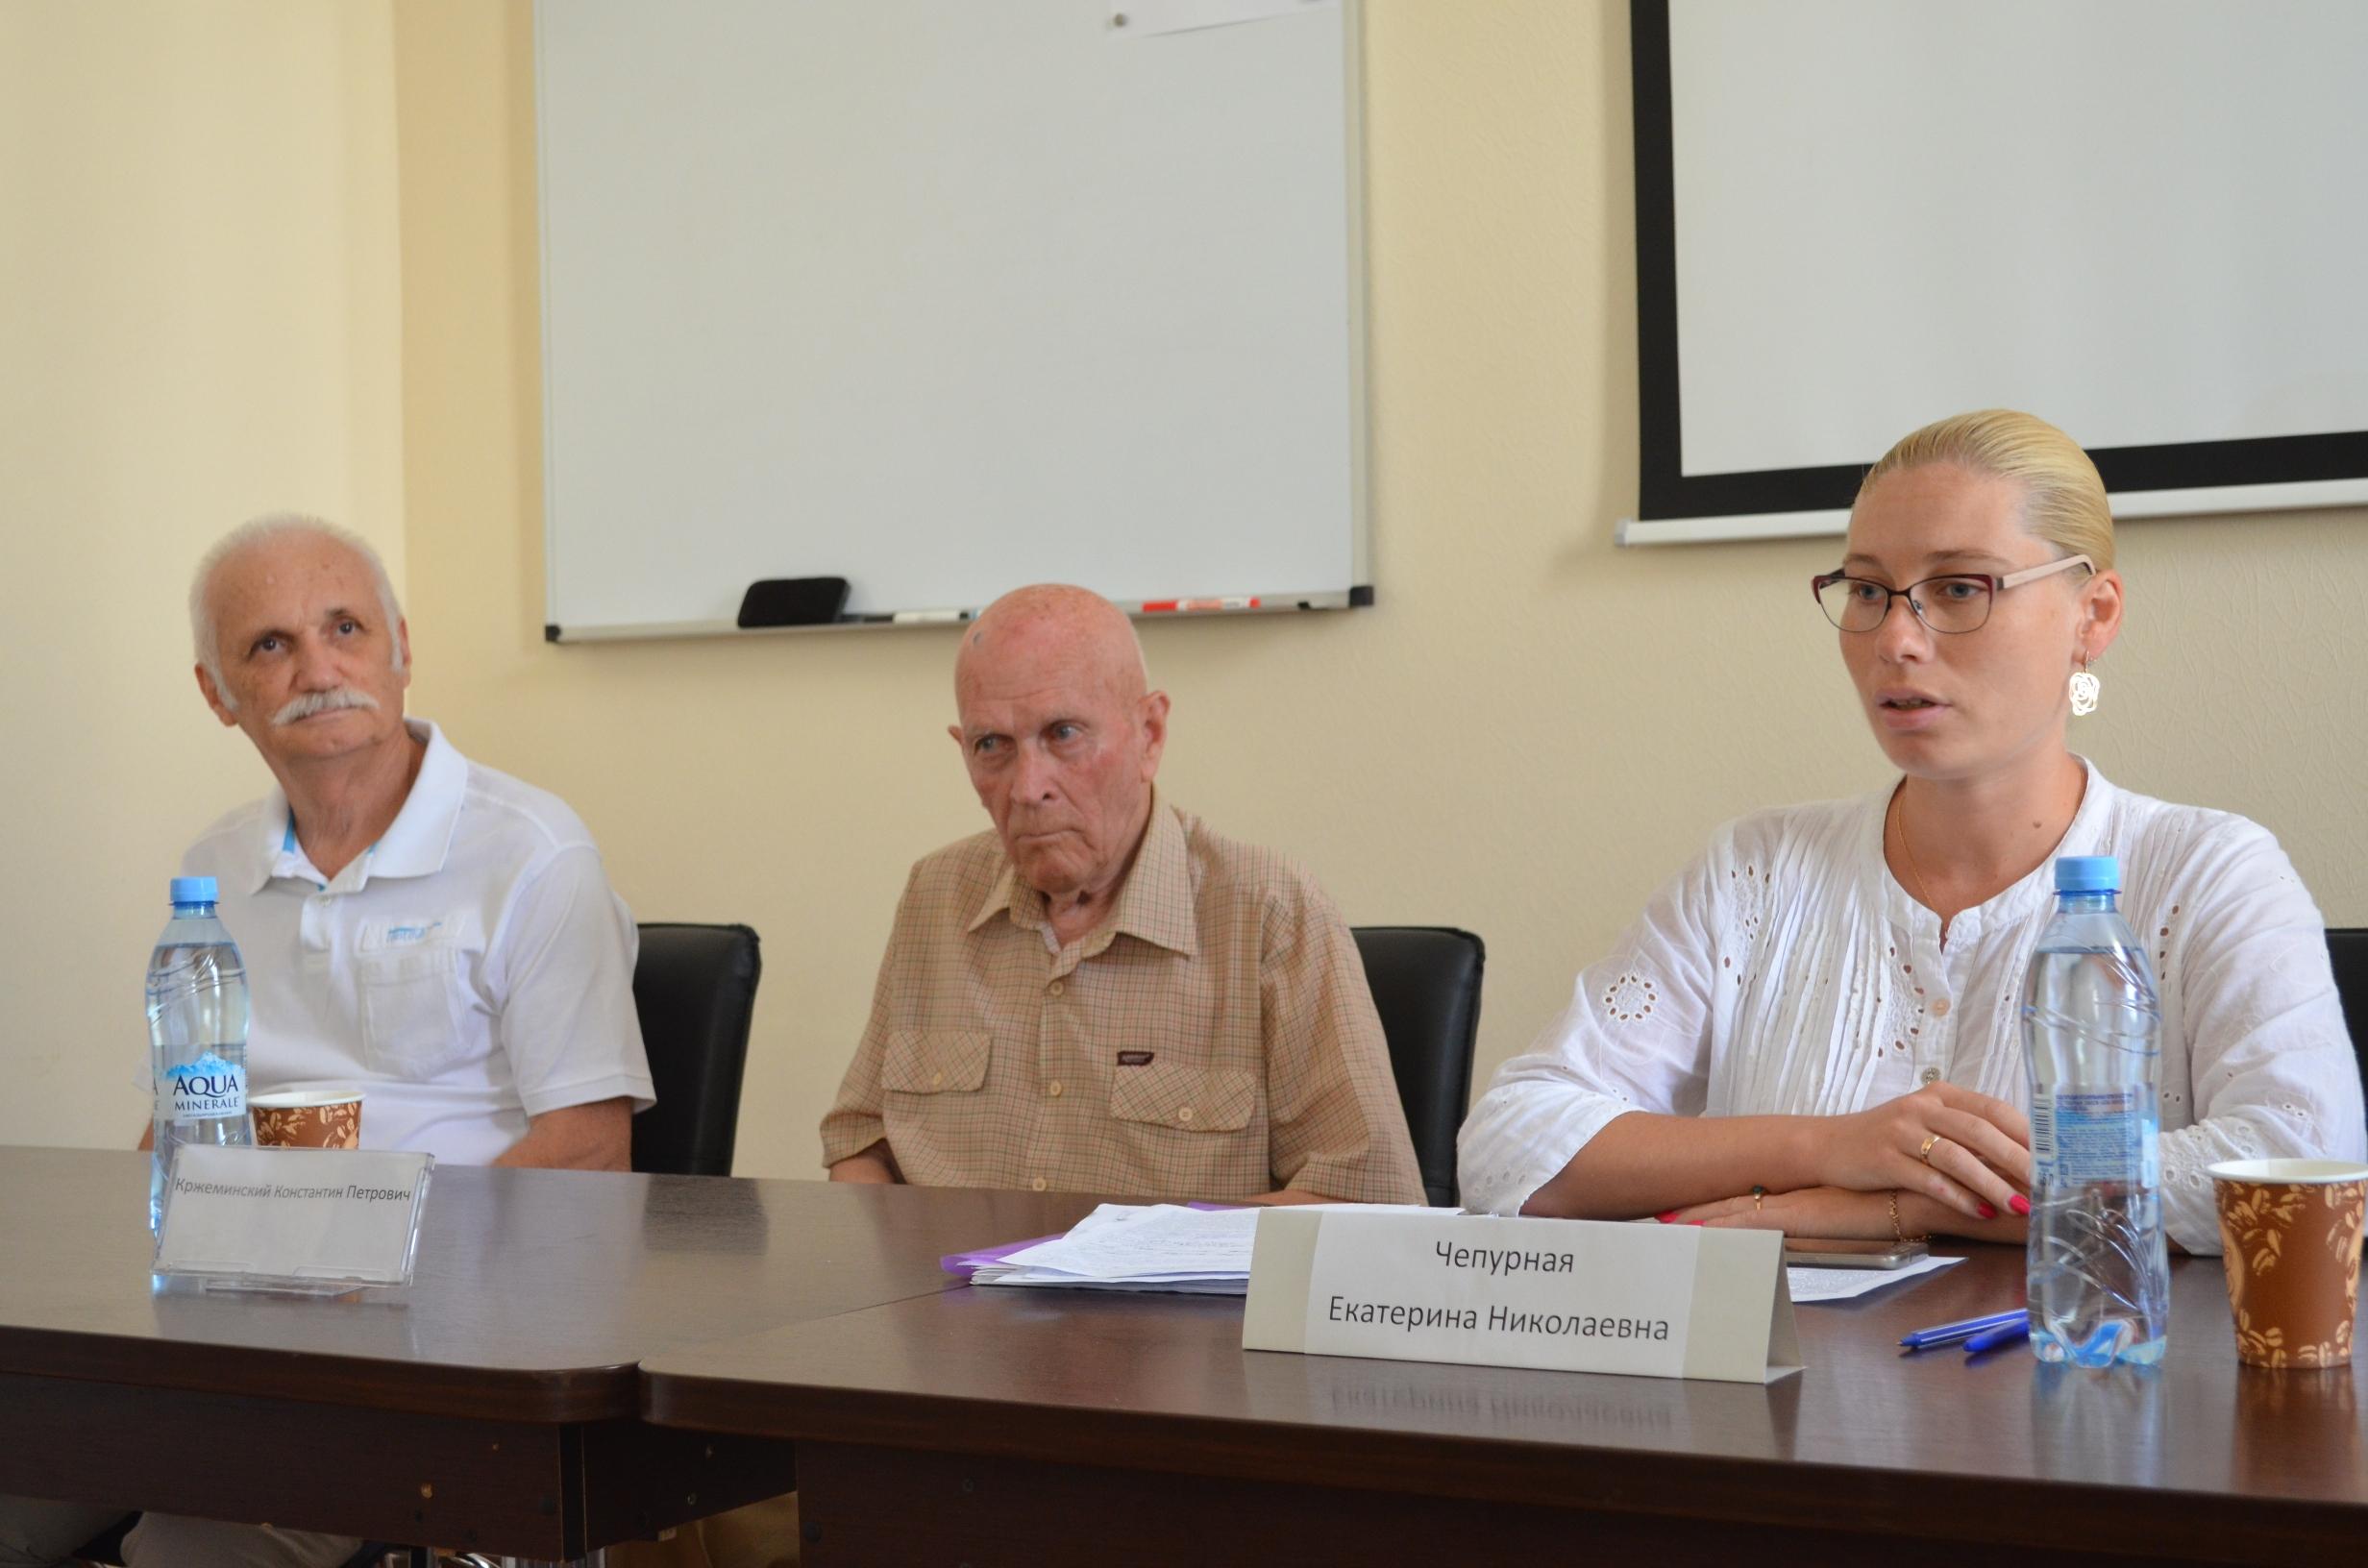 20170714-В Севастополе прошла пресс-конференция «Лики примирения»-pic1